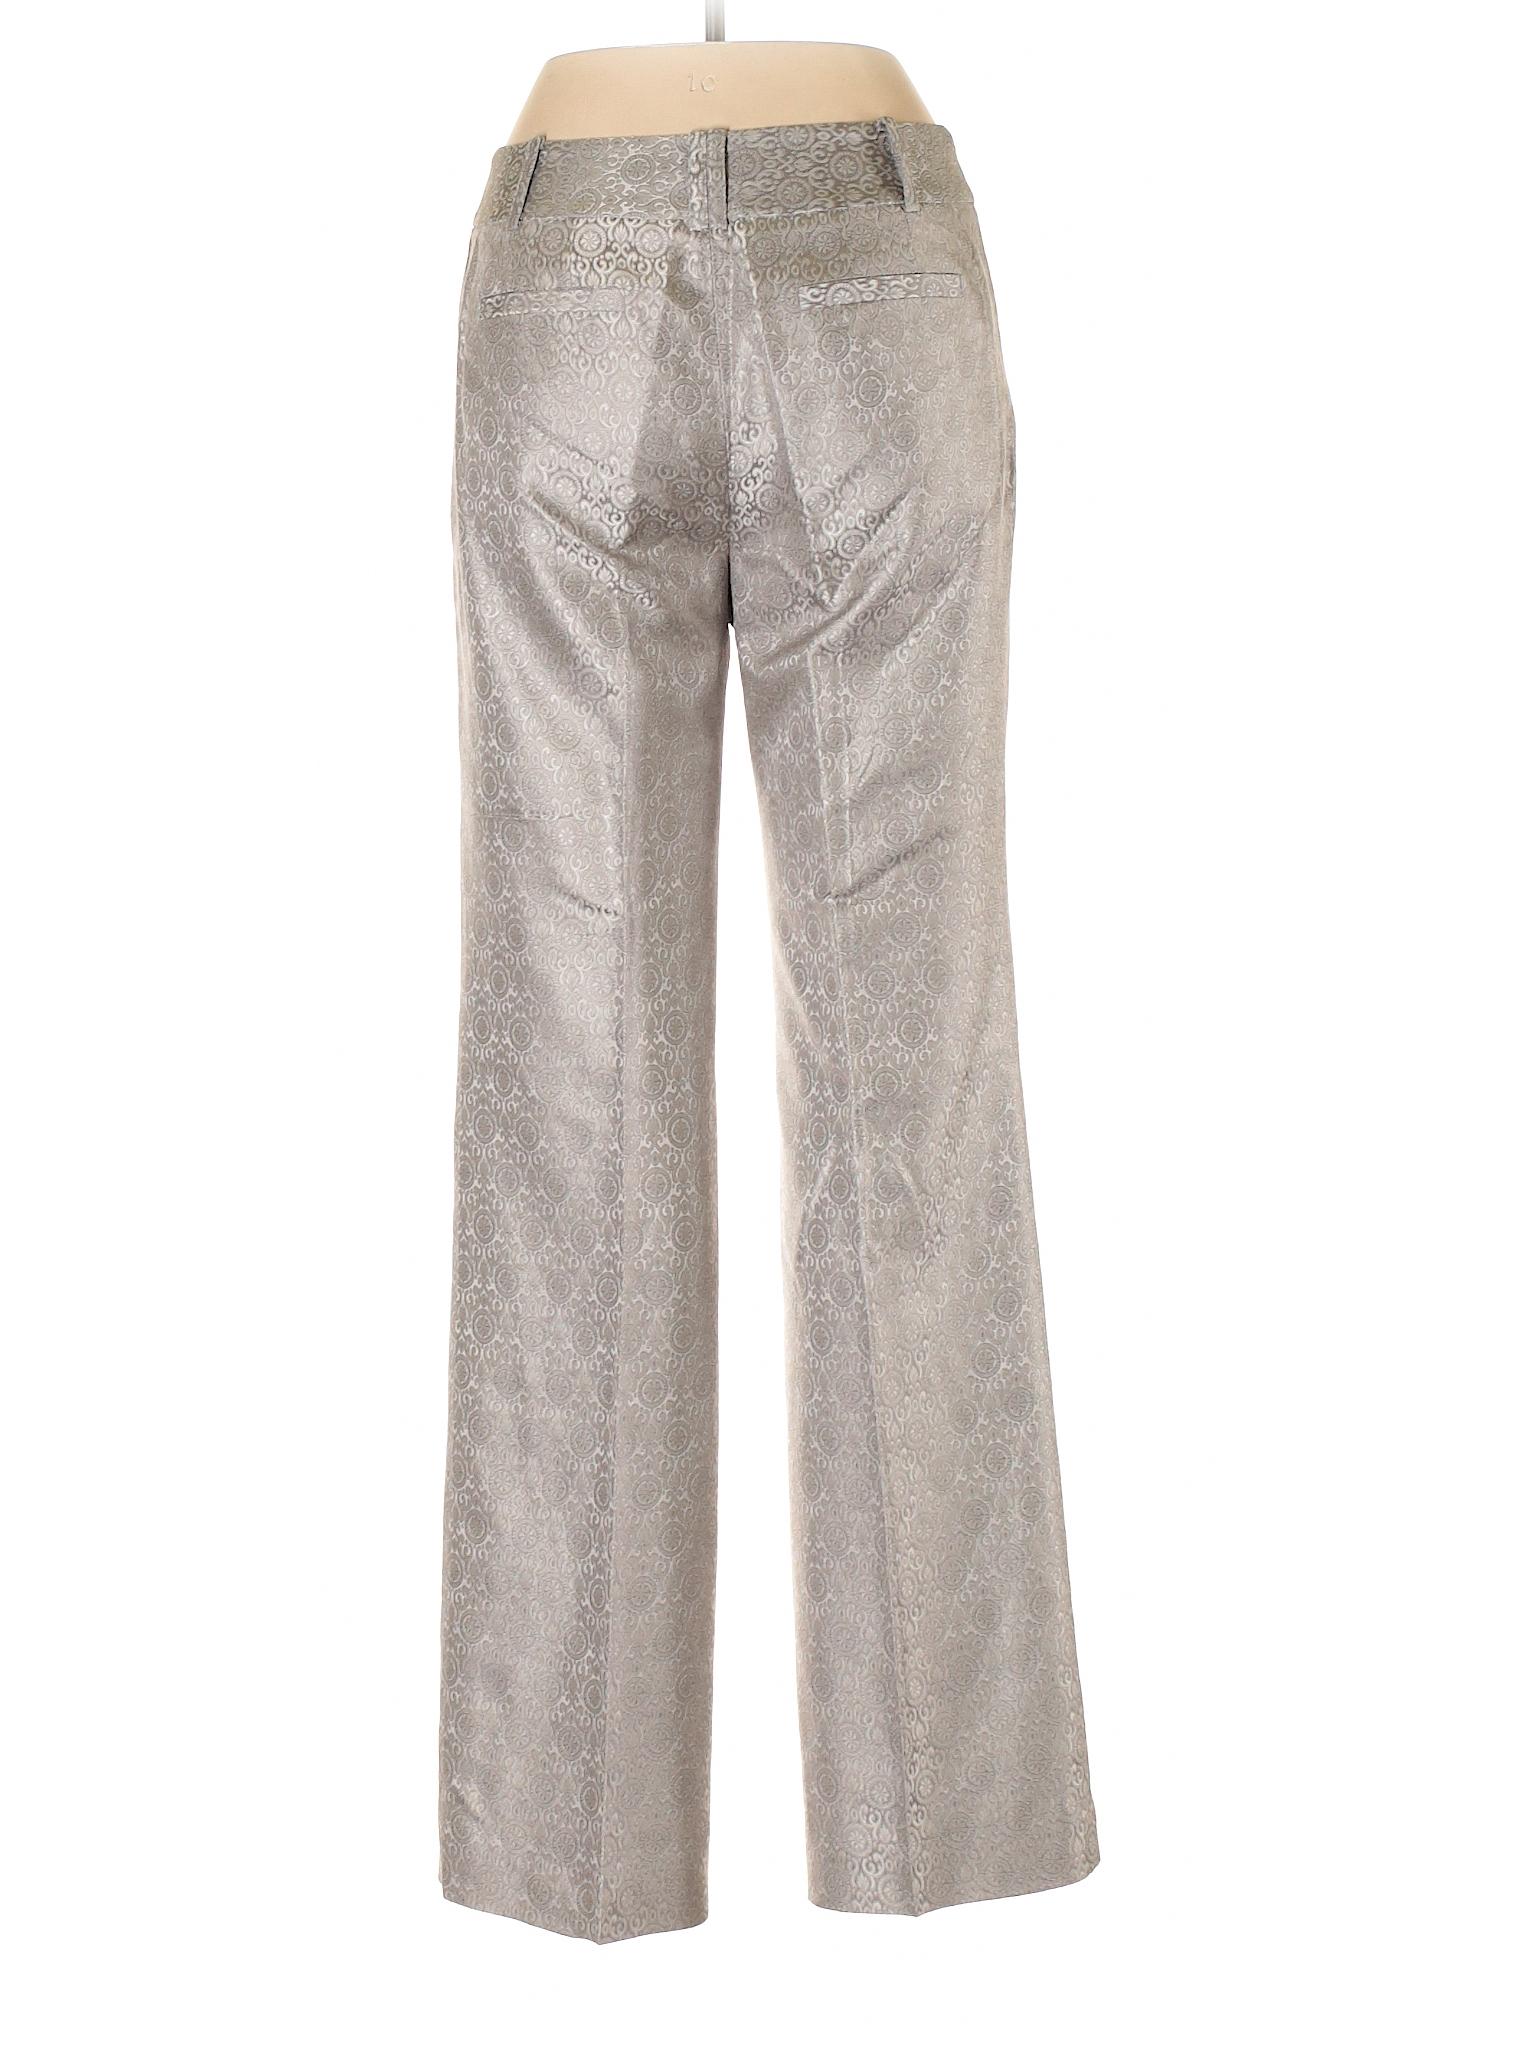 Silk Pants Taylor Leisure winter Ann g8tqwpa